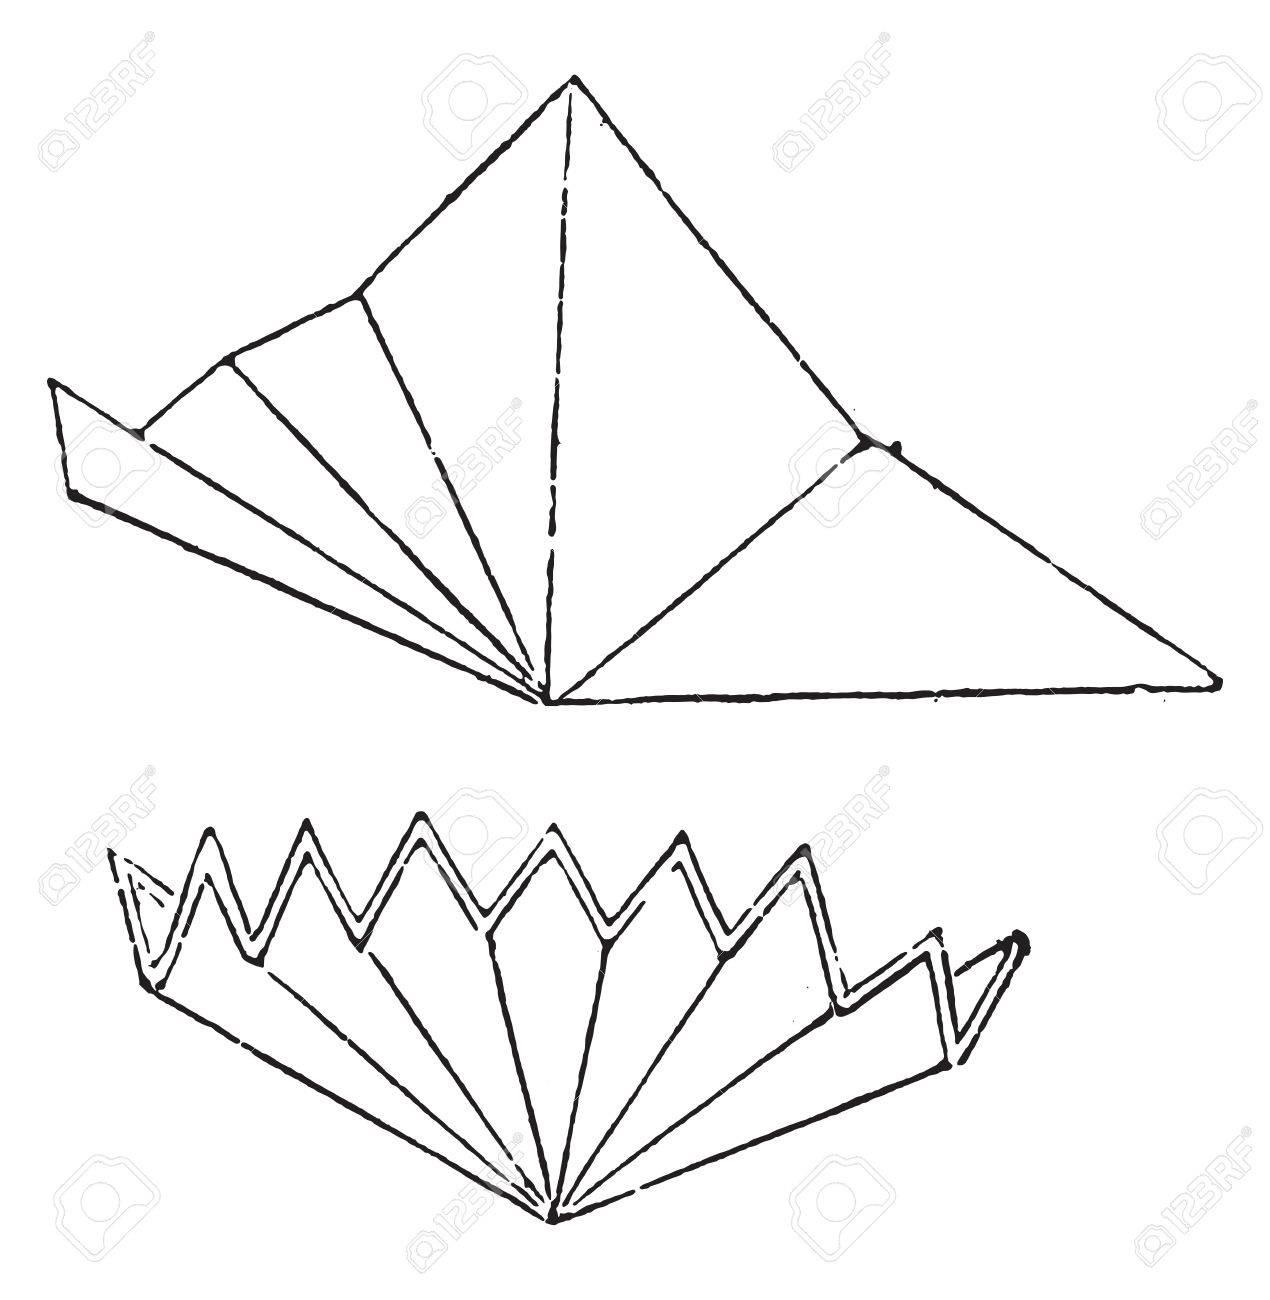 premiere way to fold the filter paper vintage engraved illustration